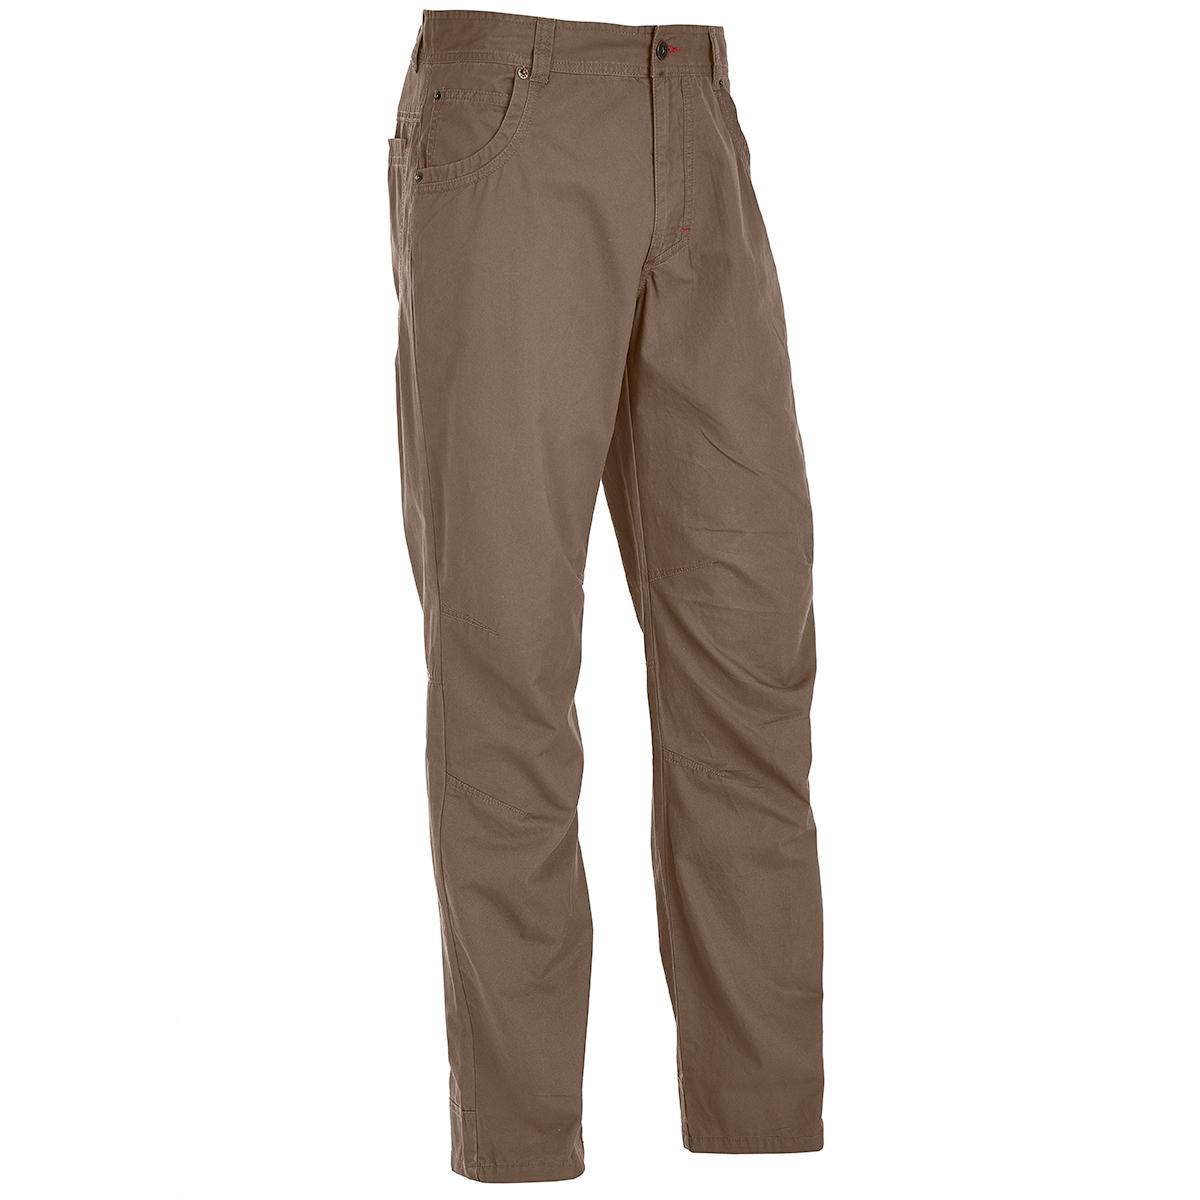 Ems Men's Rohne Lean Pants - Brown, 32/32